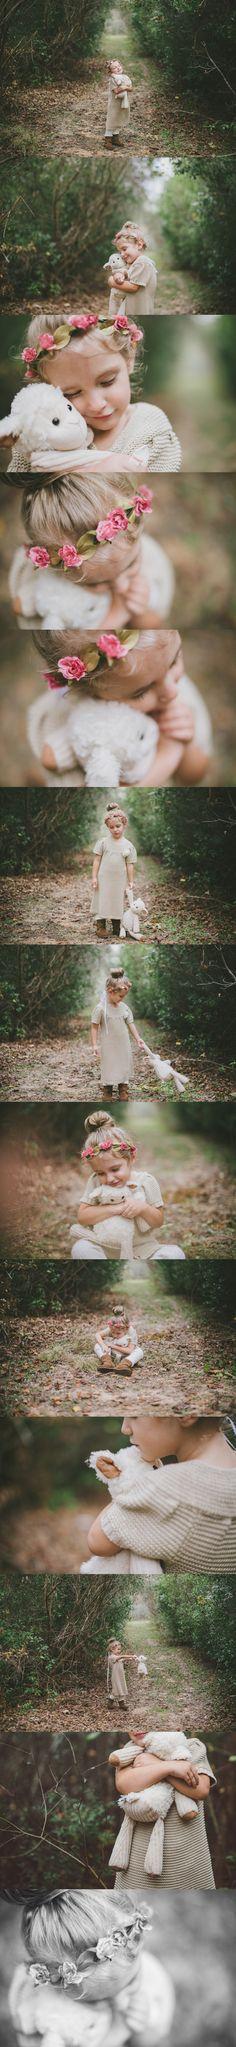 Jessi Field Photography